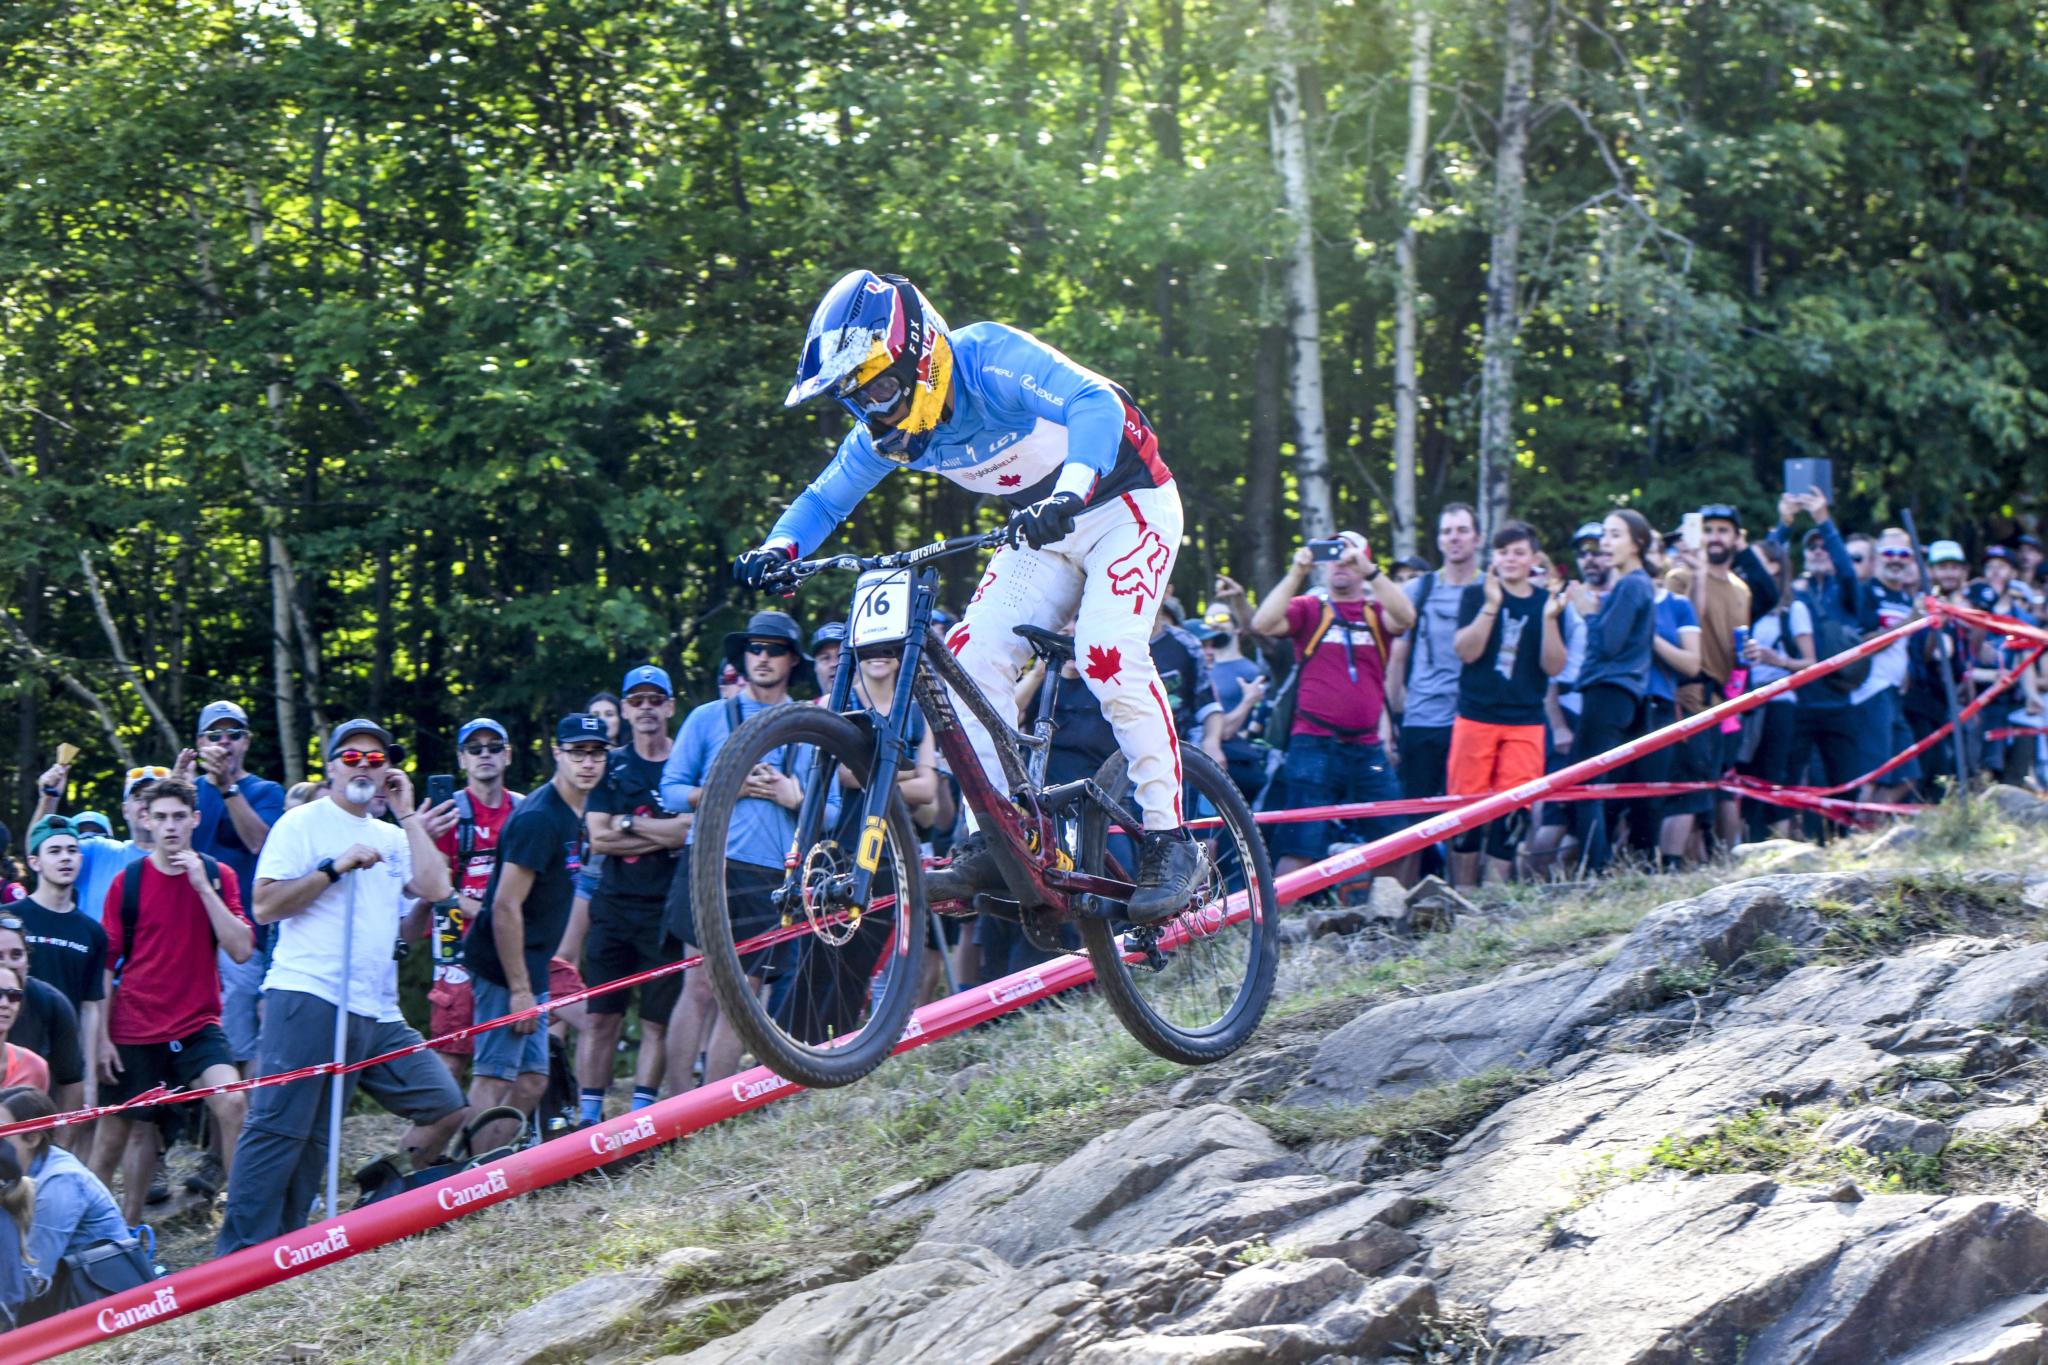 Calendrier Bmx 2019.Mountain Bike Archives Cycling Canada Cyclisme